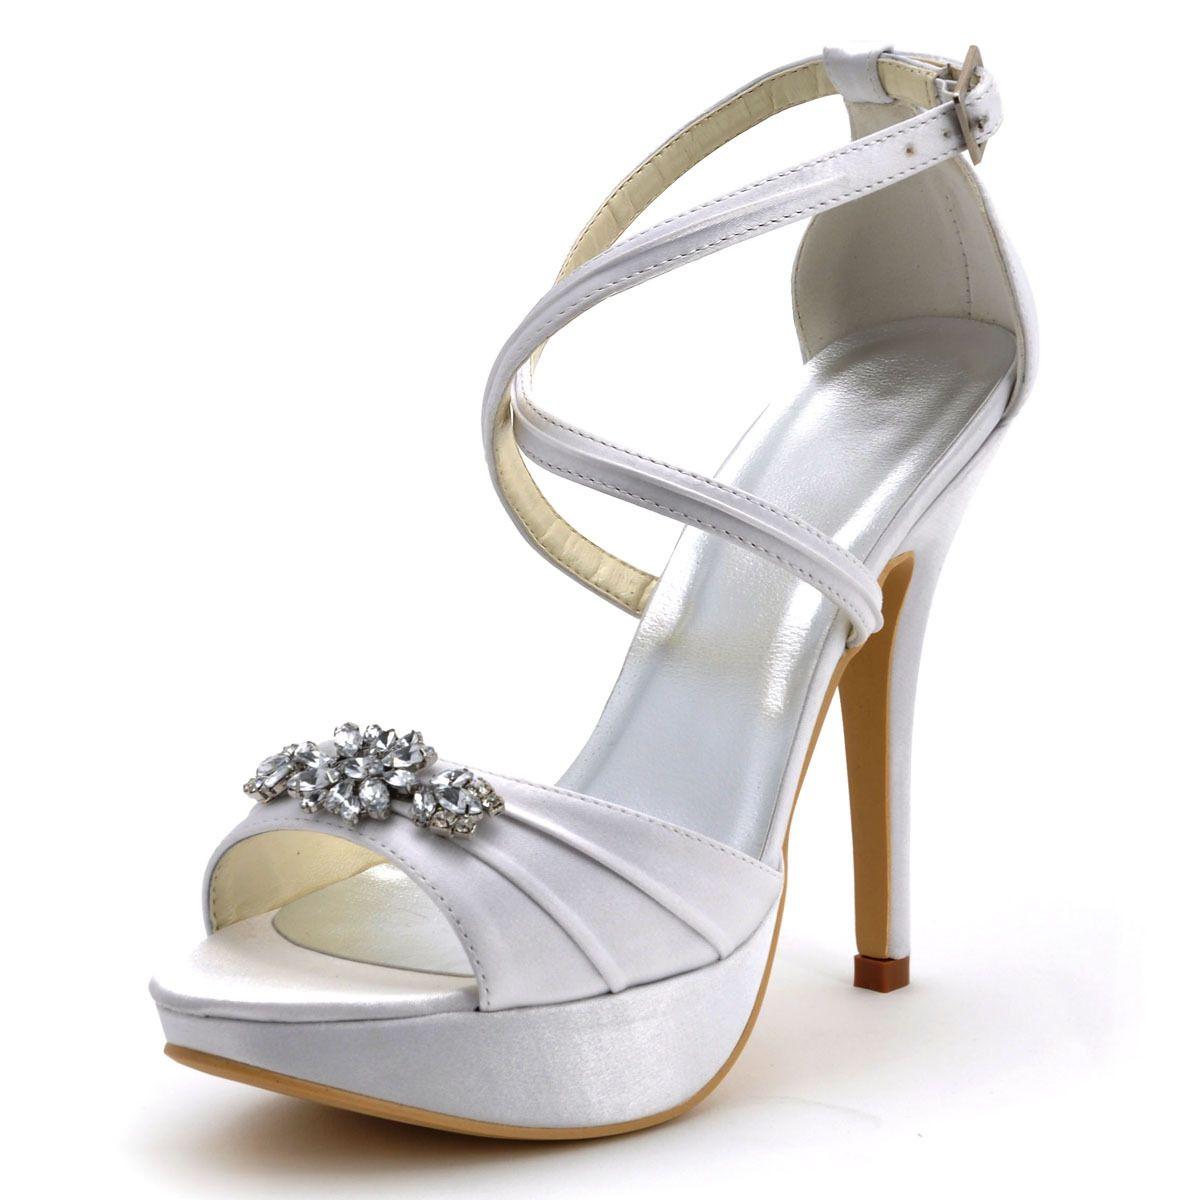 2015 New Fashion White Wedding Shoee Beaded T Straps High Heels